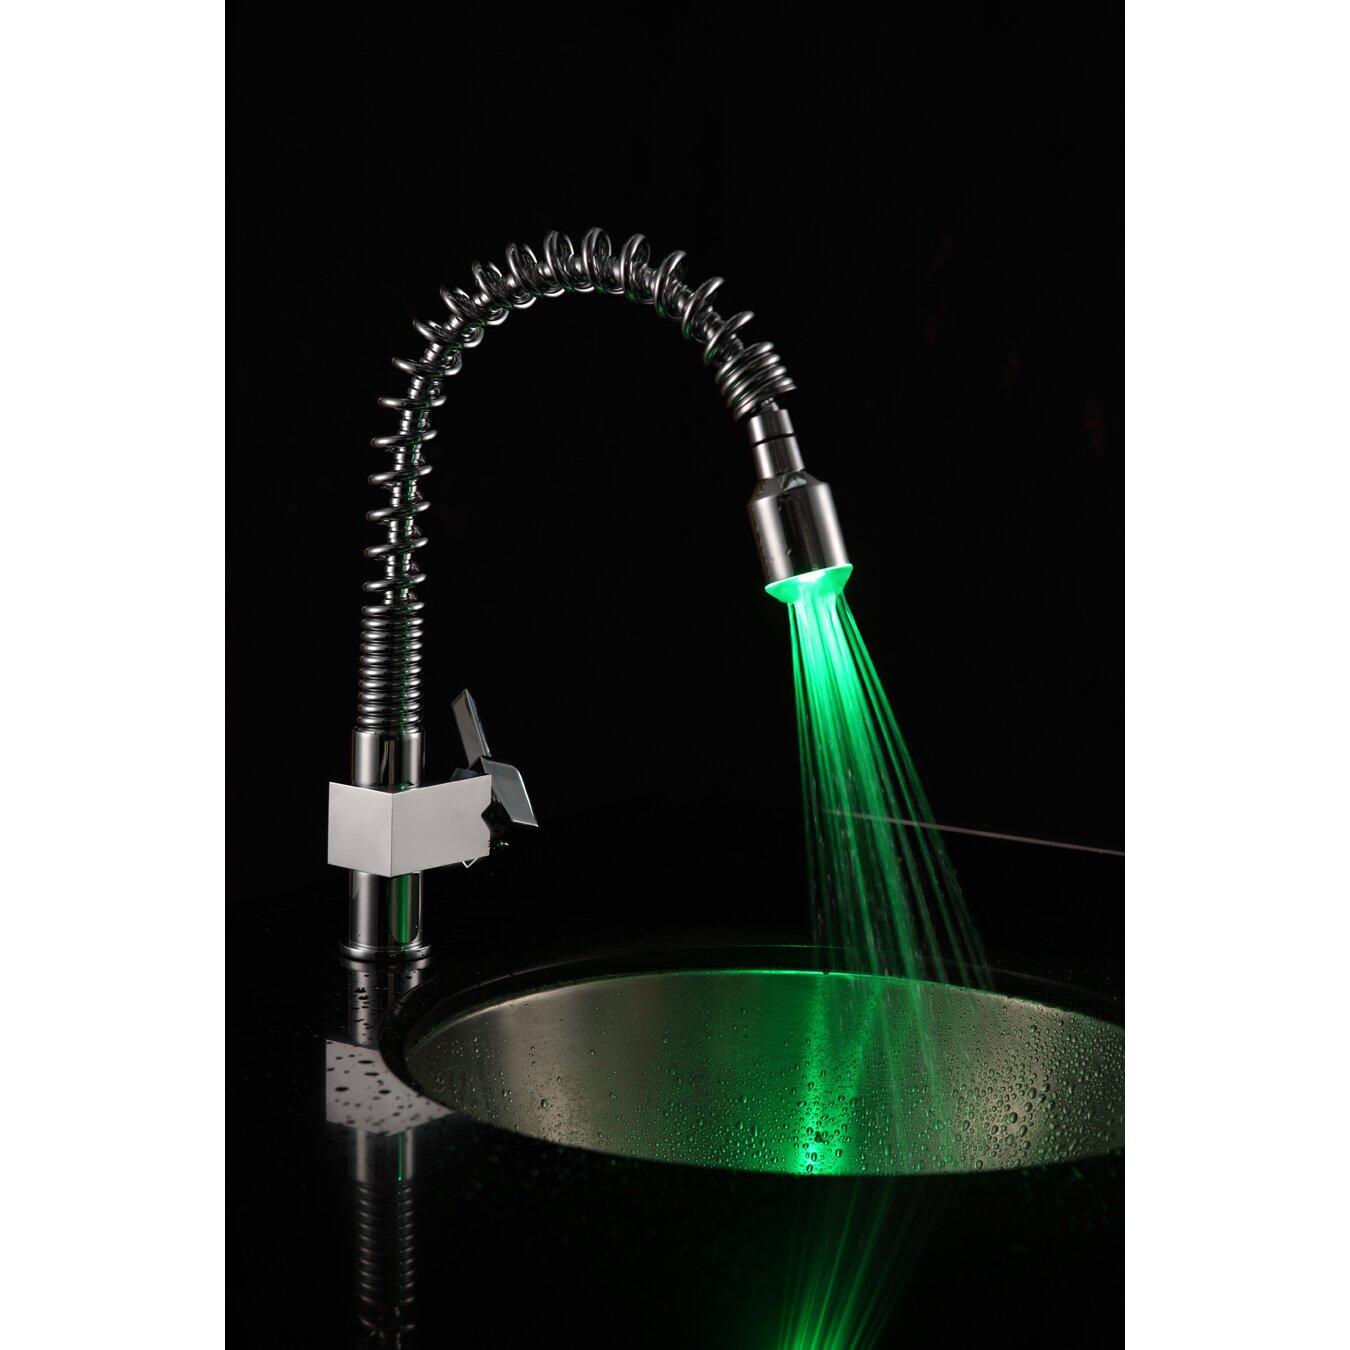 sumerain single handle deck mount led kitchen faucet with